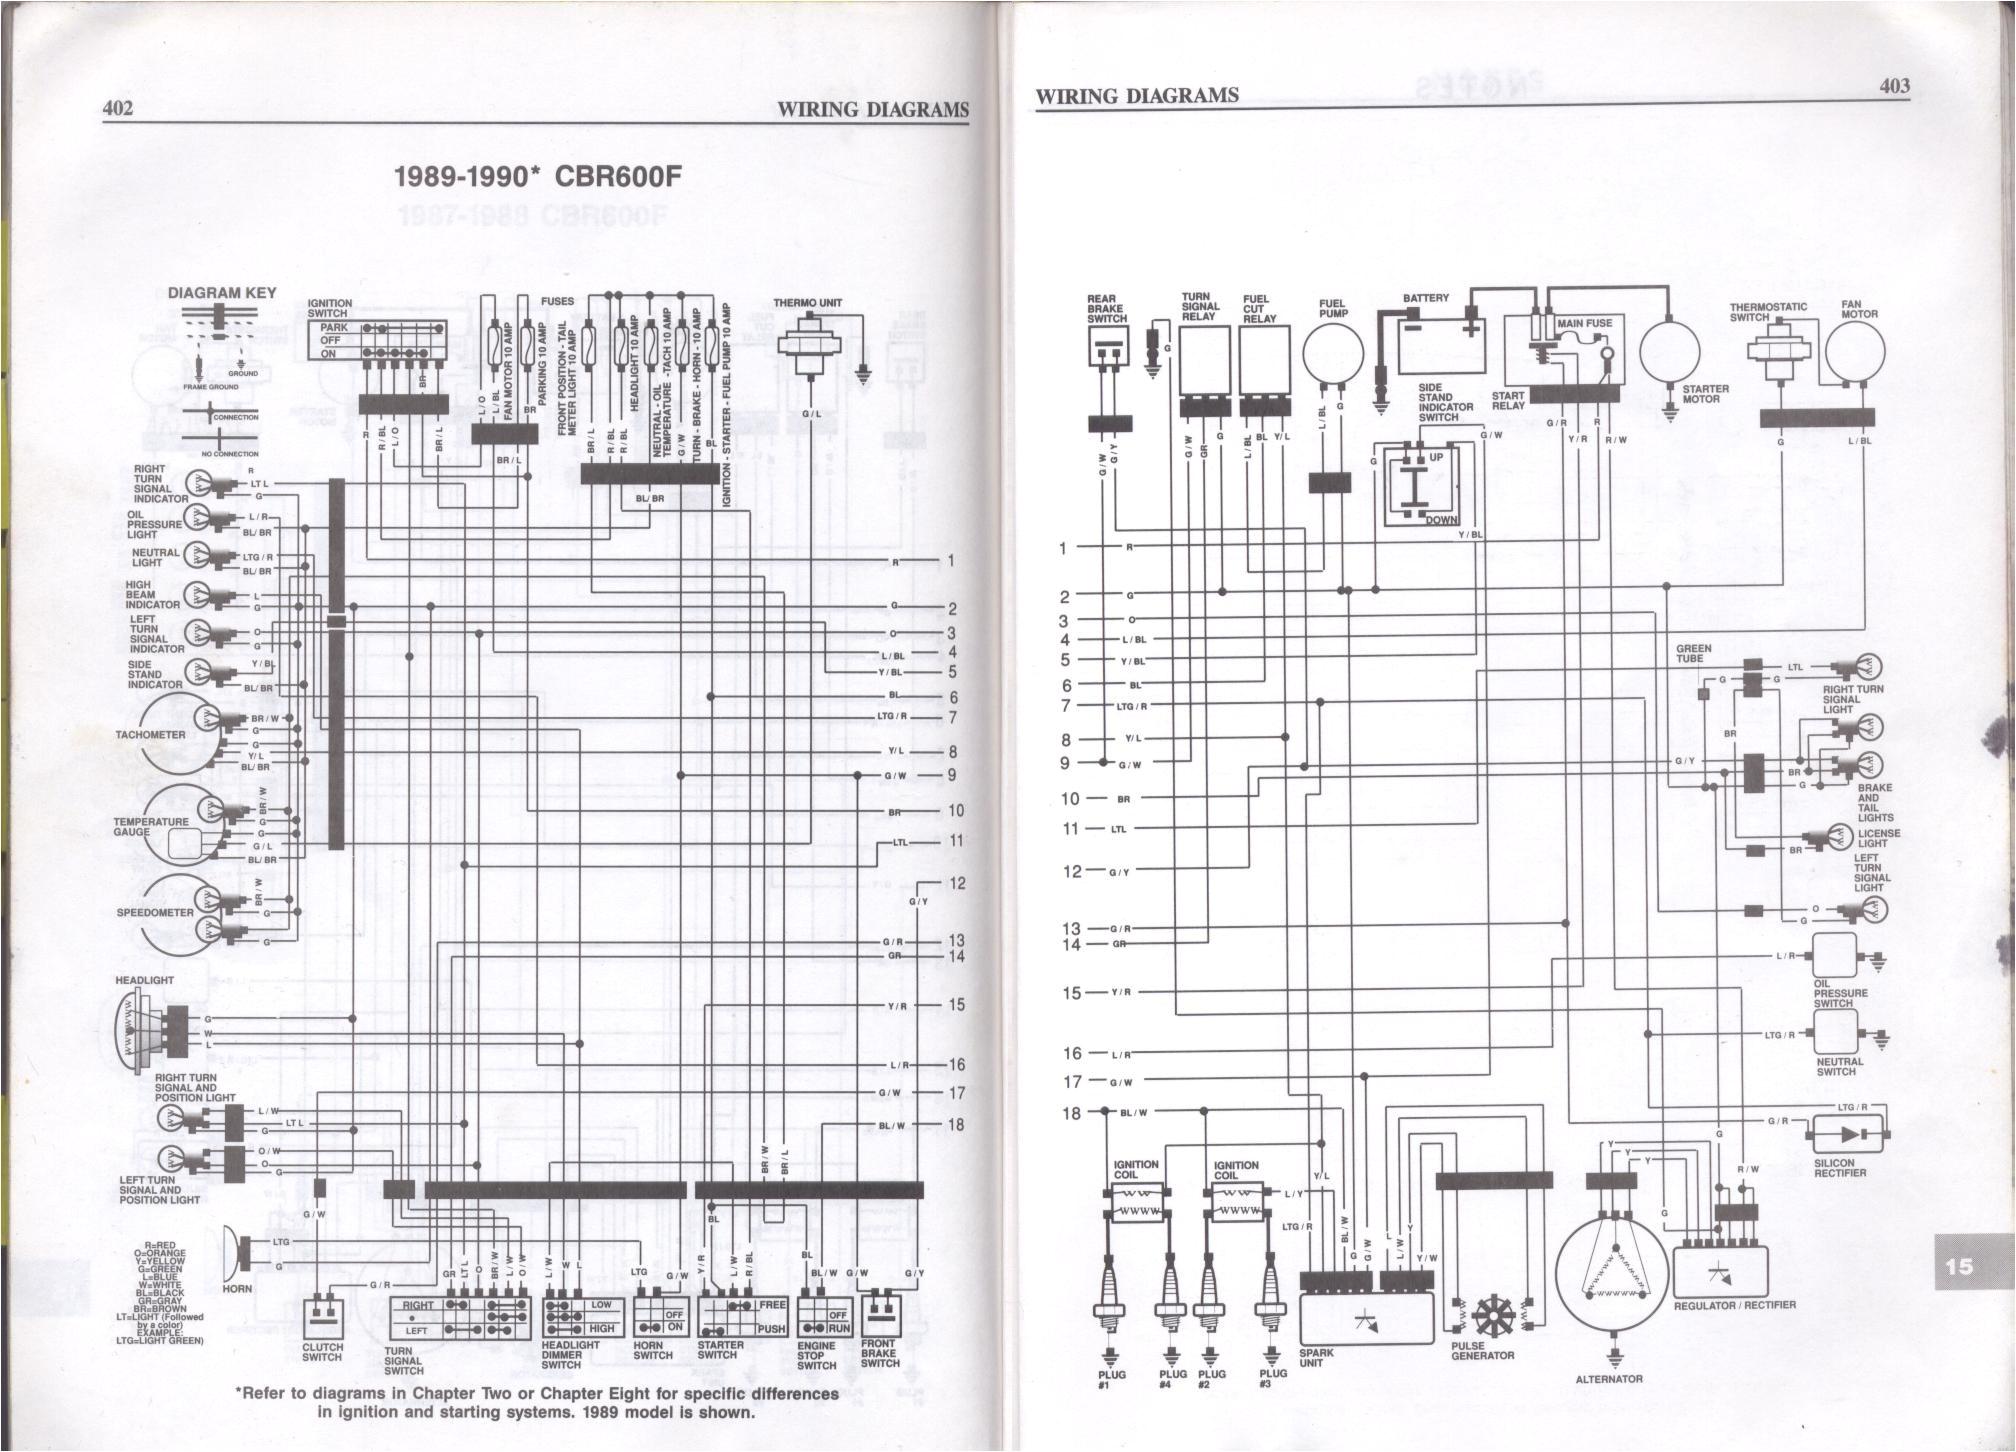 cbr f3 wiring diagram wiring diagram option 1989 cbr 600 wiring diagram